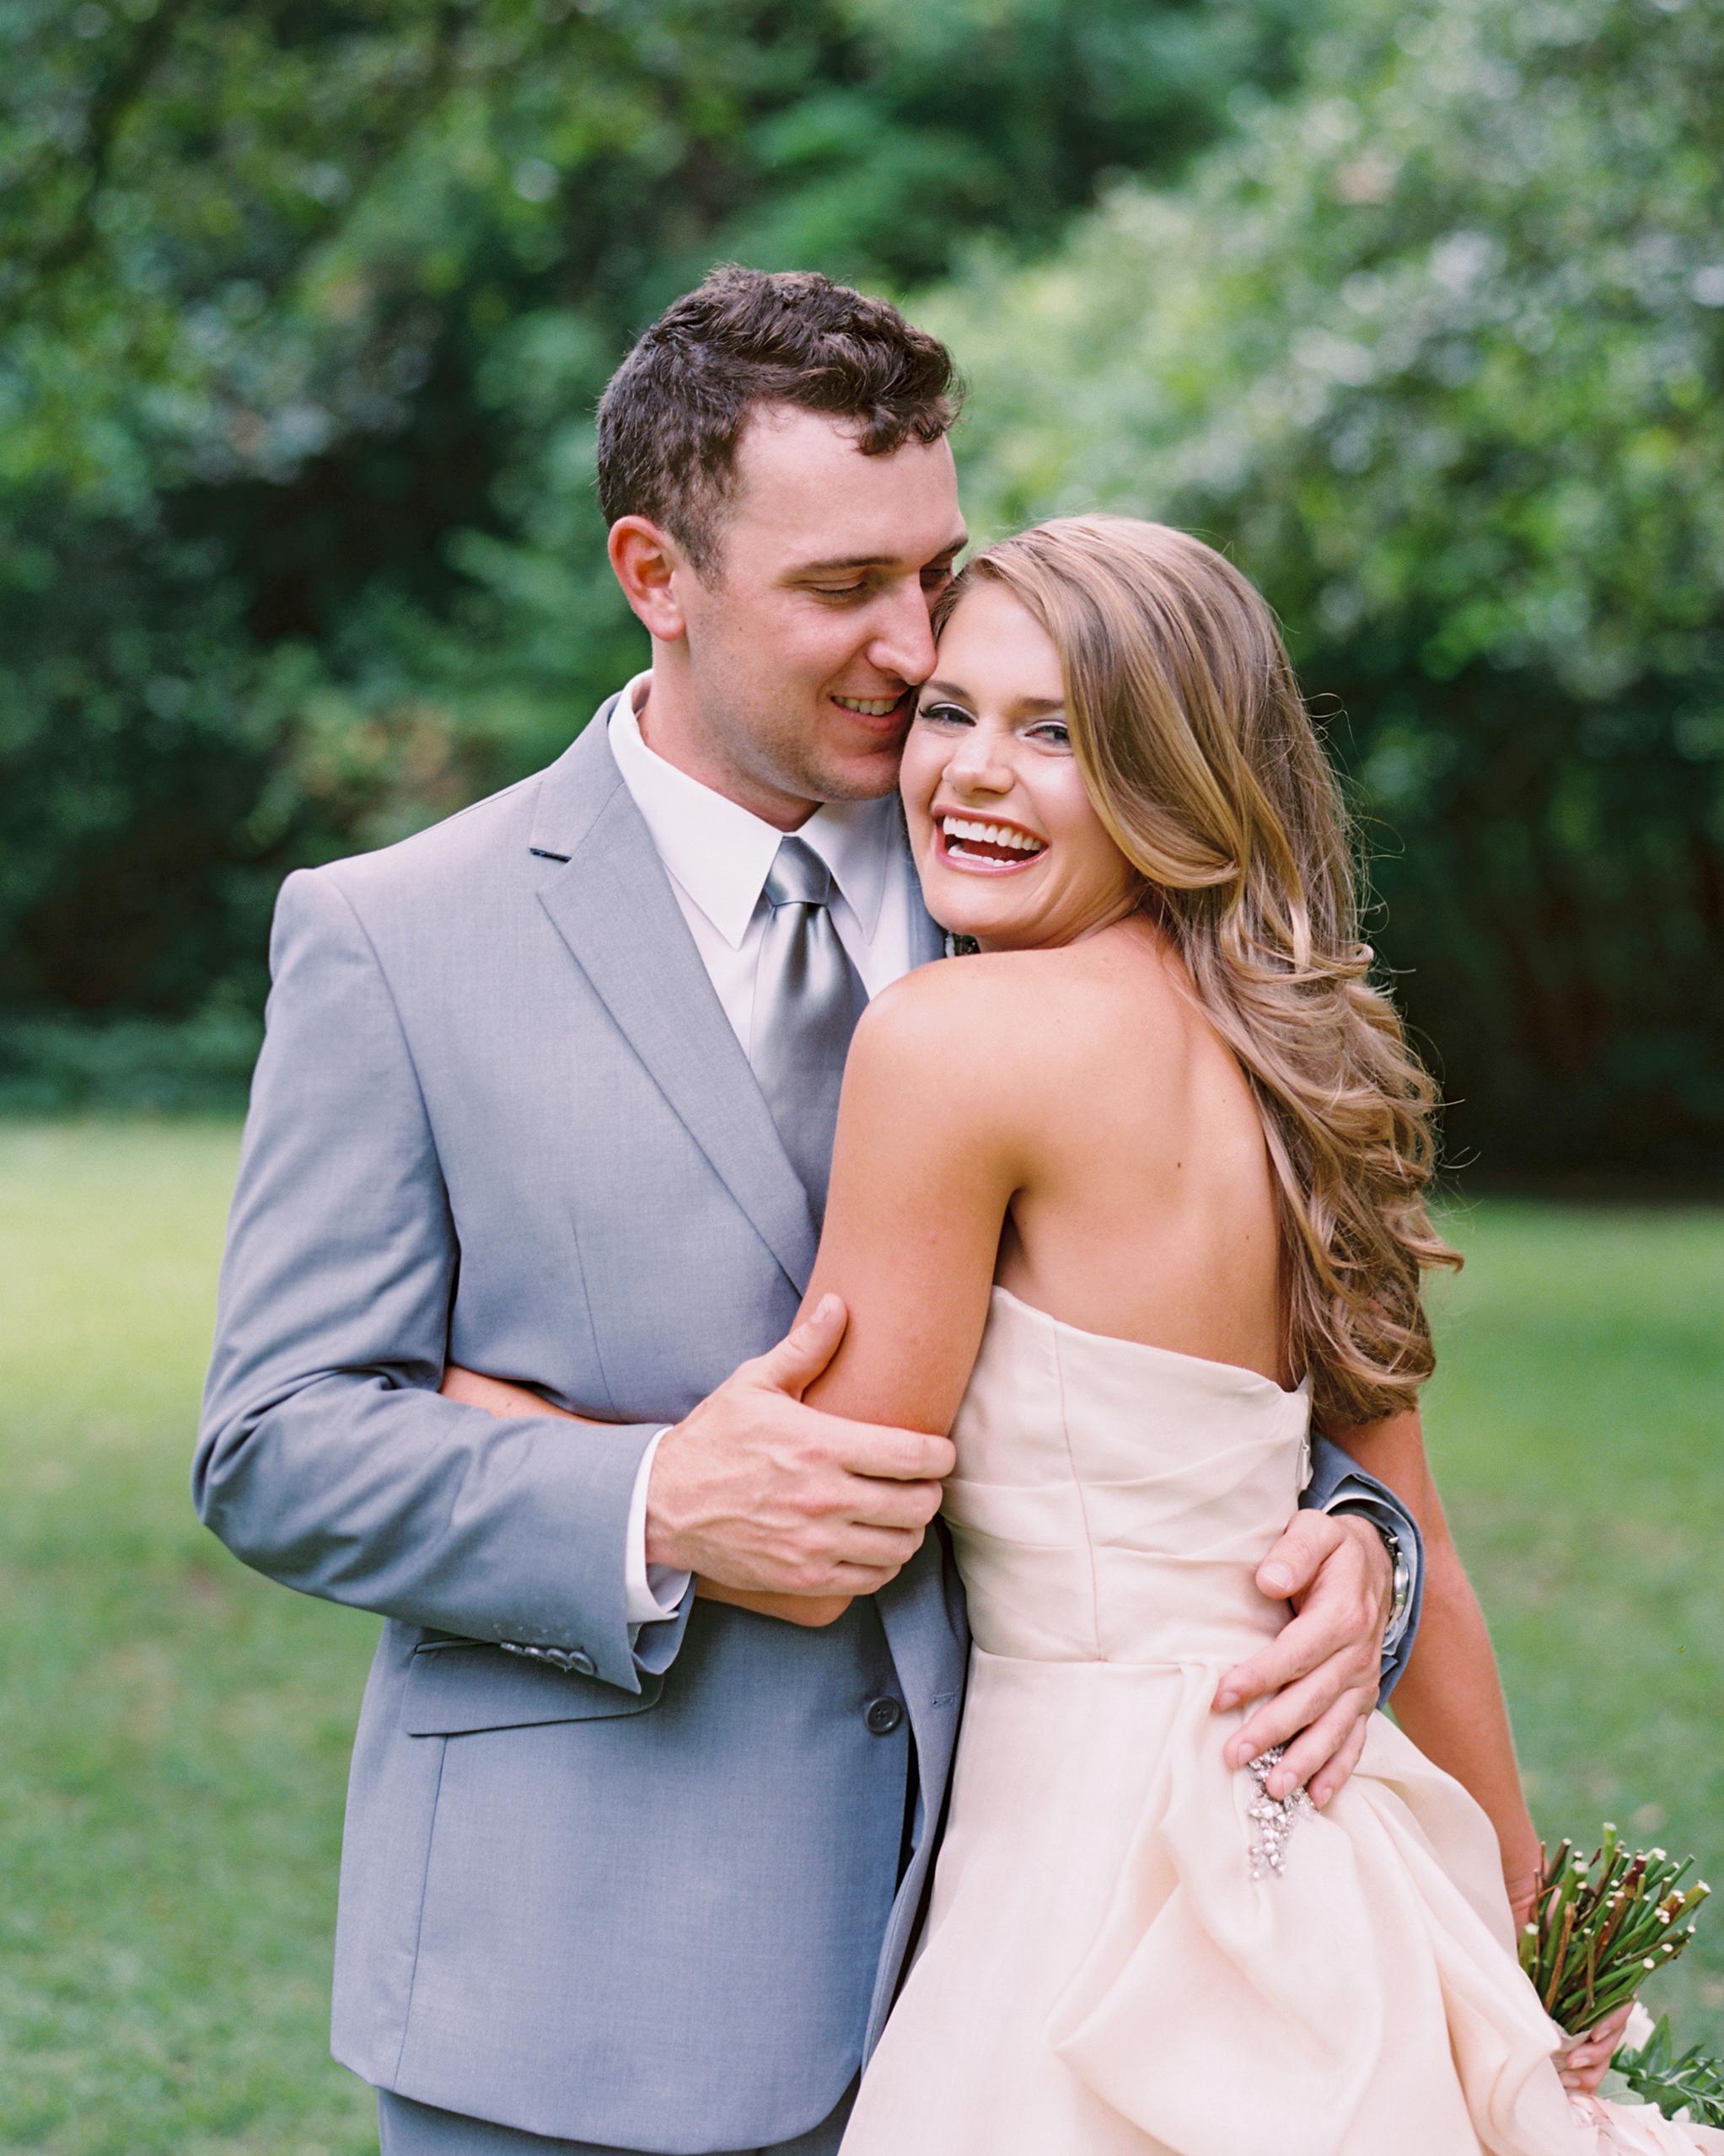 irby-adam-wedding-couple-104-s111660-1014.jpg